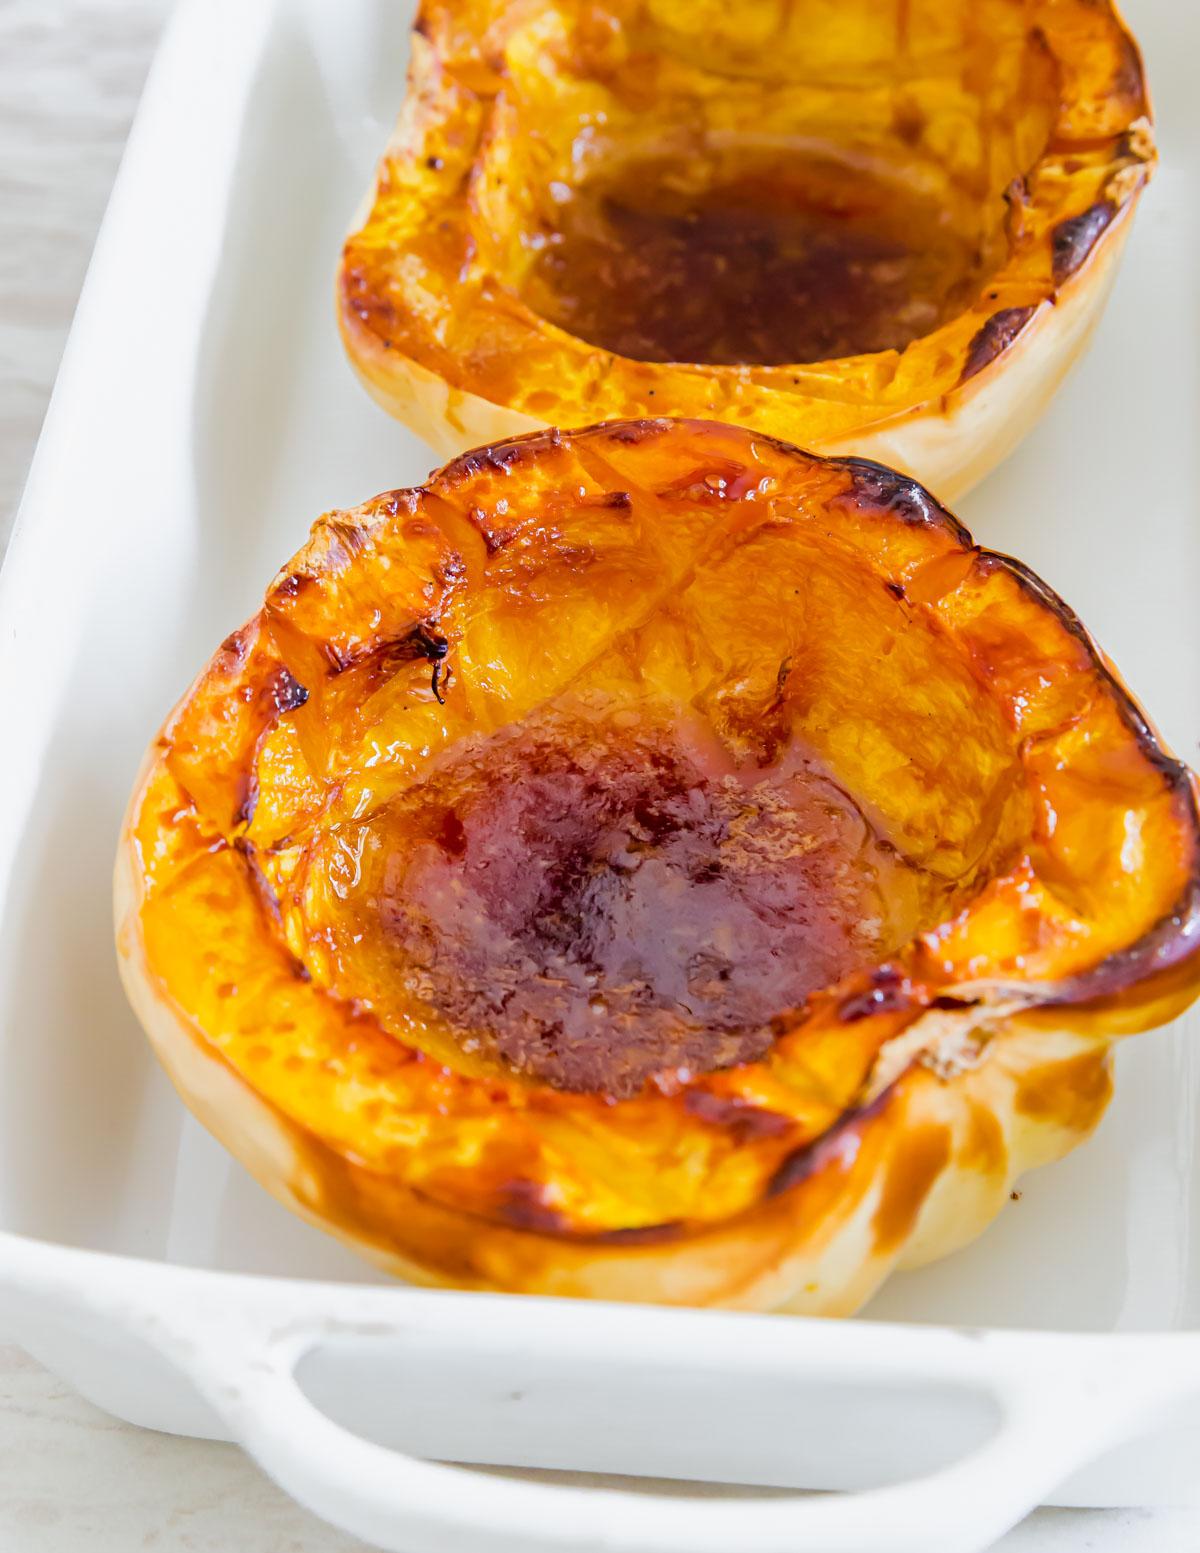 maple baked white acorn squash after baking